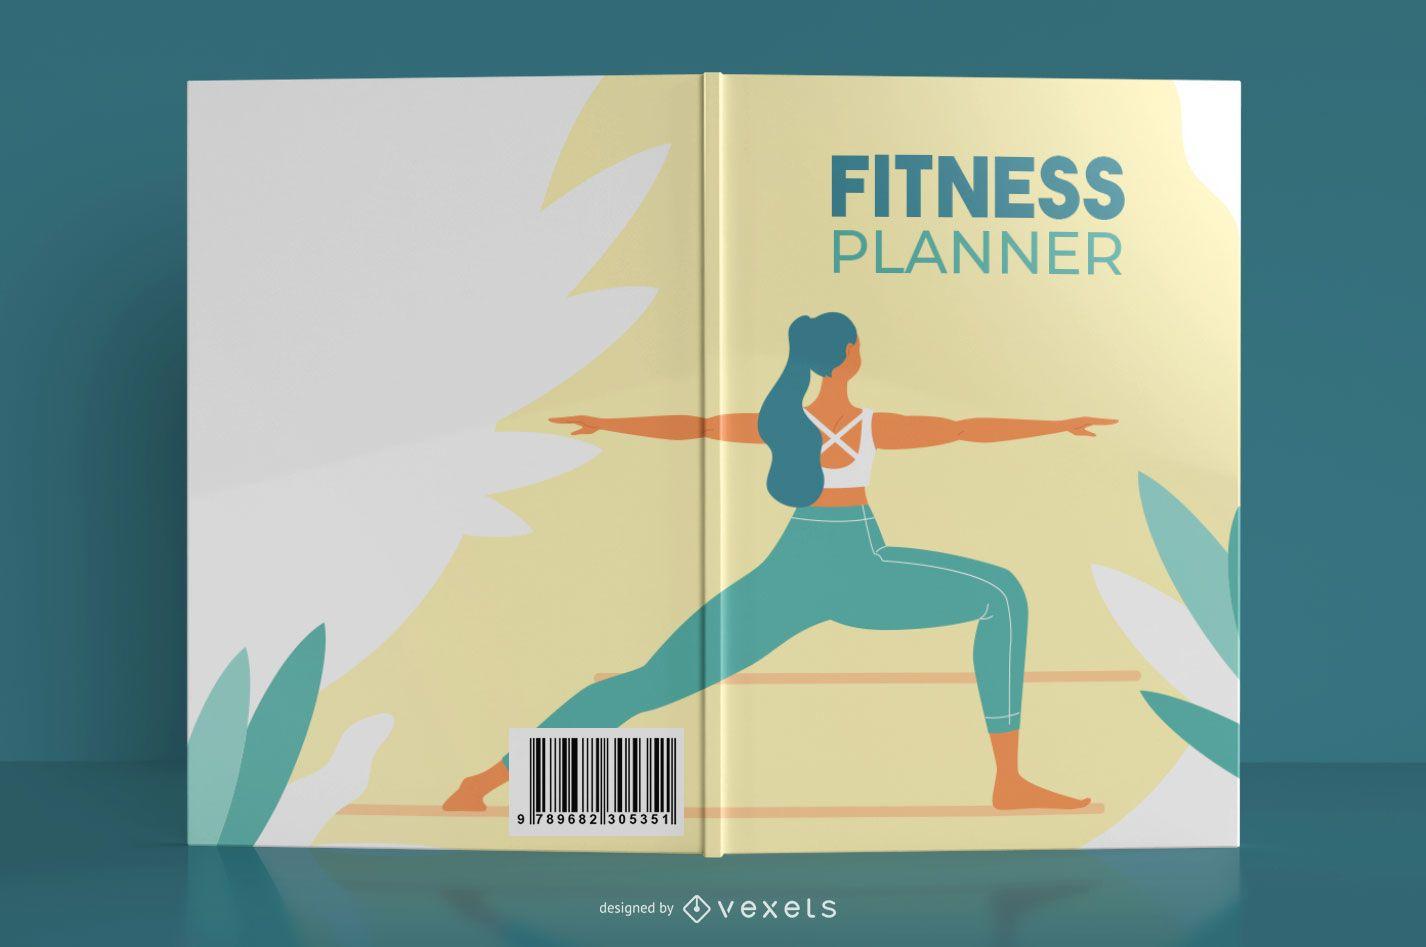 Diseño de portada de libro de planificador de fitness de yoga